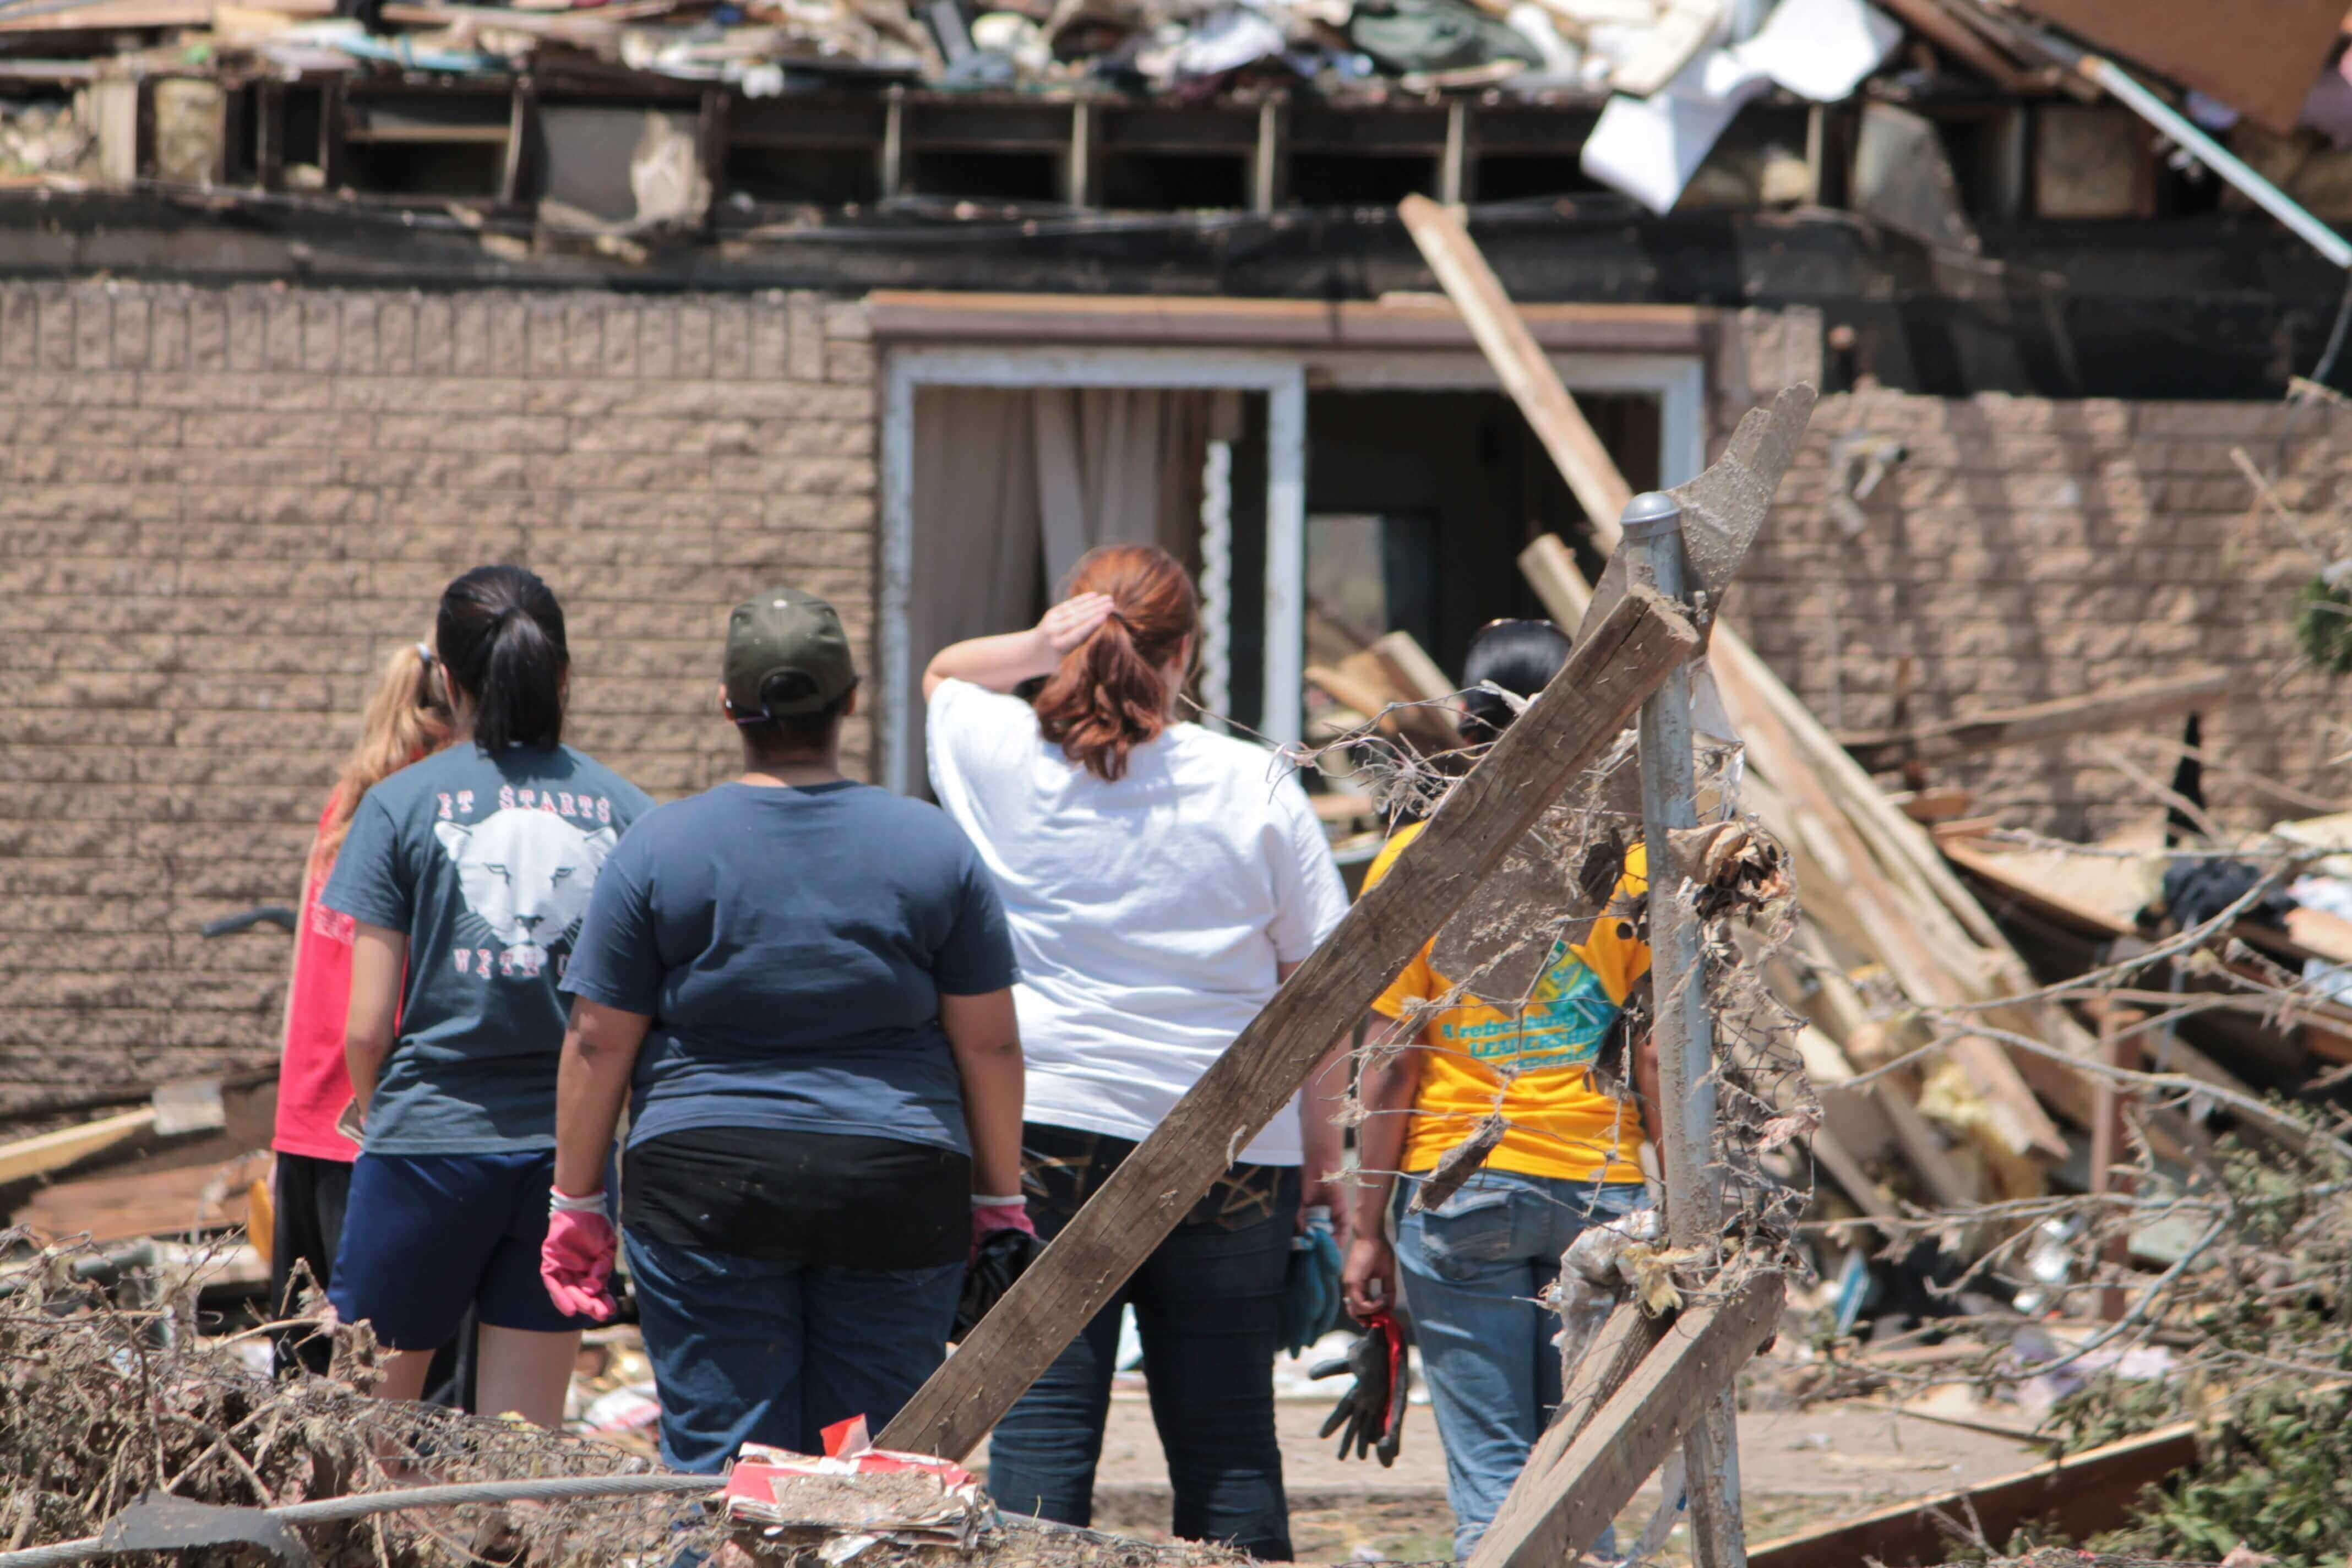 Katy, Texas Homeowners File Hurricane Harvey Damage Lawsuit